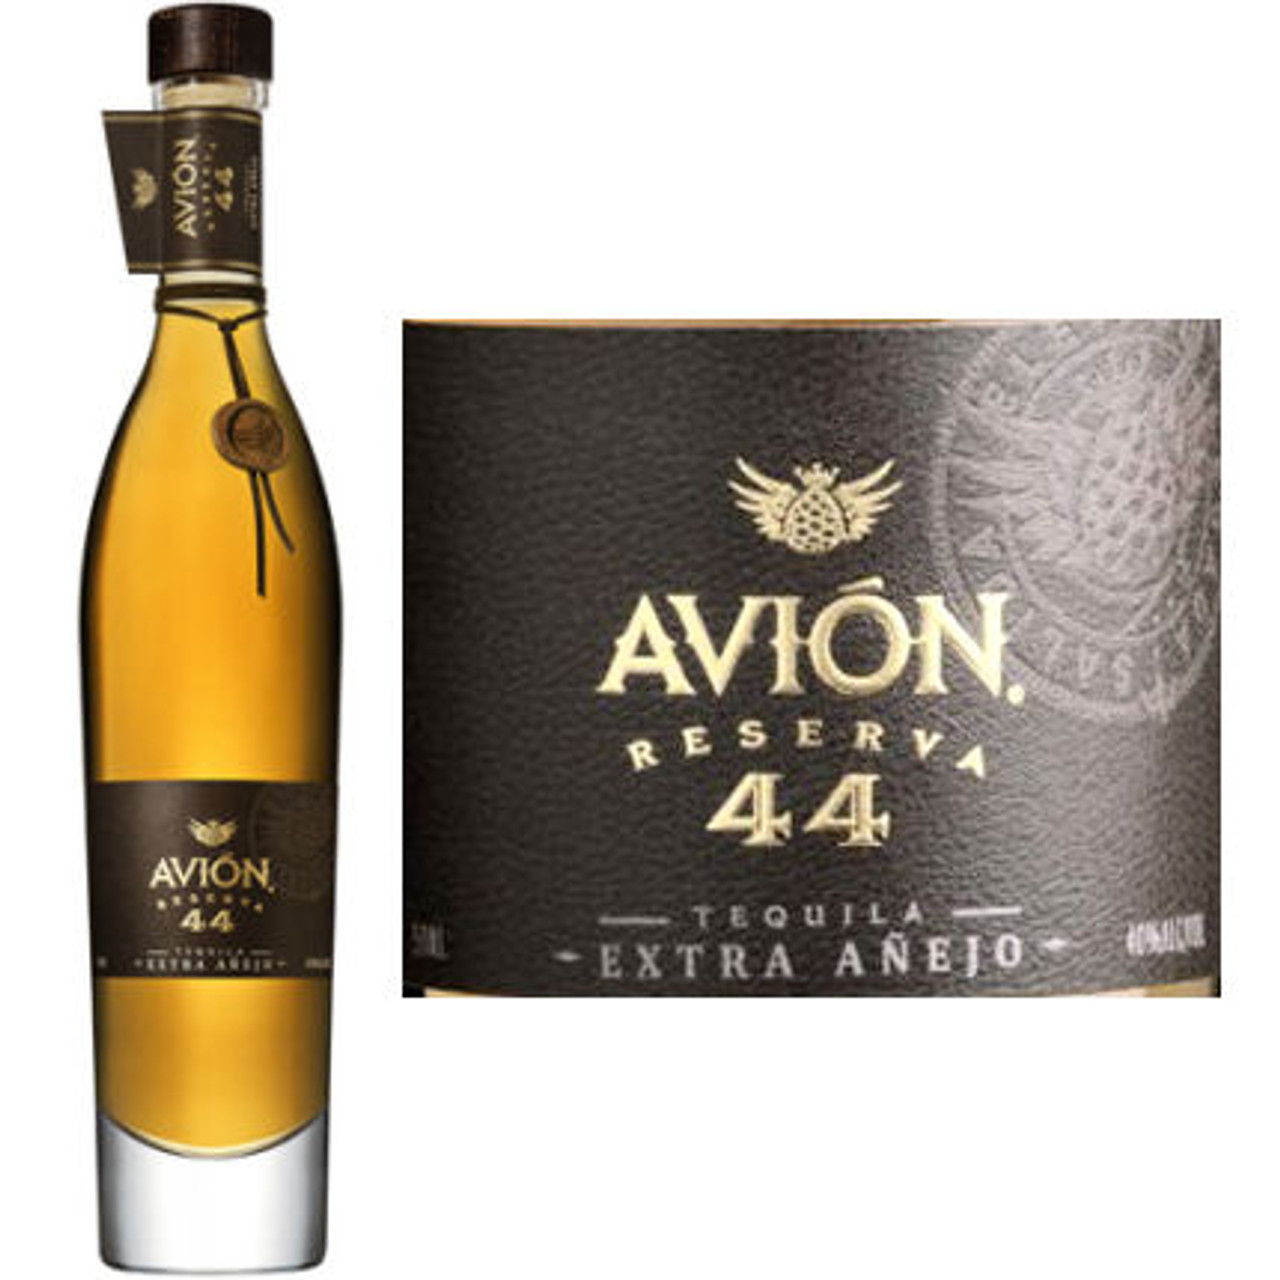 Avion Reserva 44 Extra Anejo Tequila 750ml